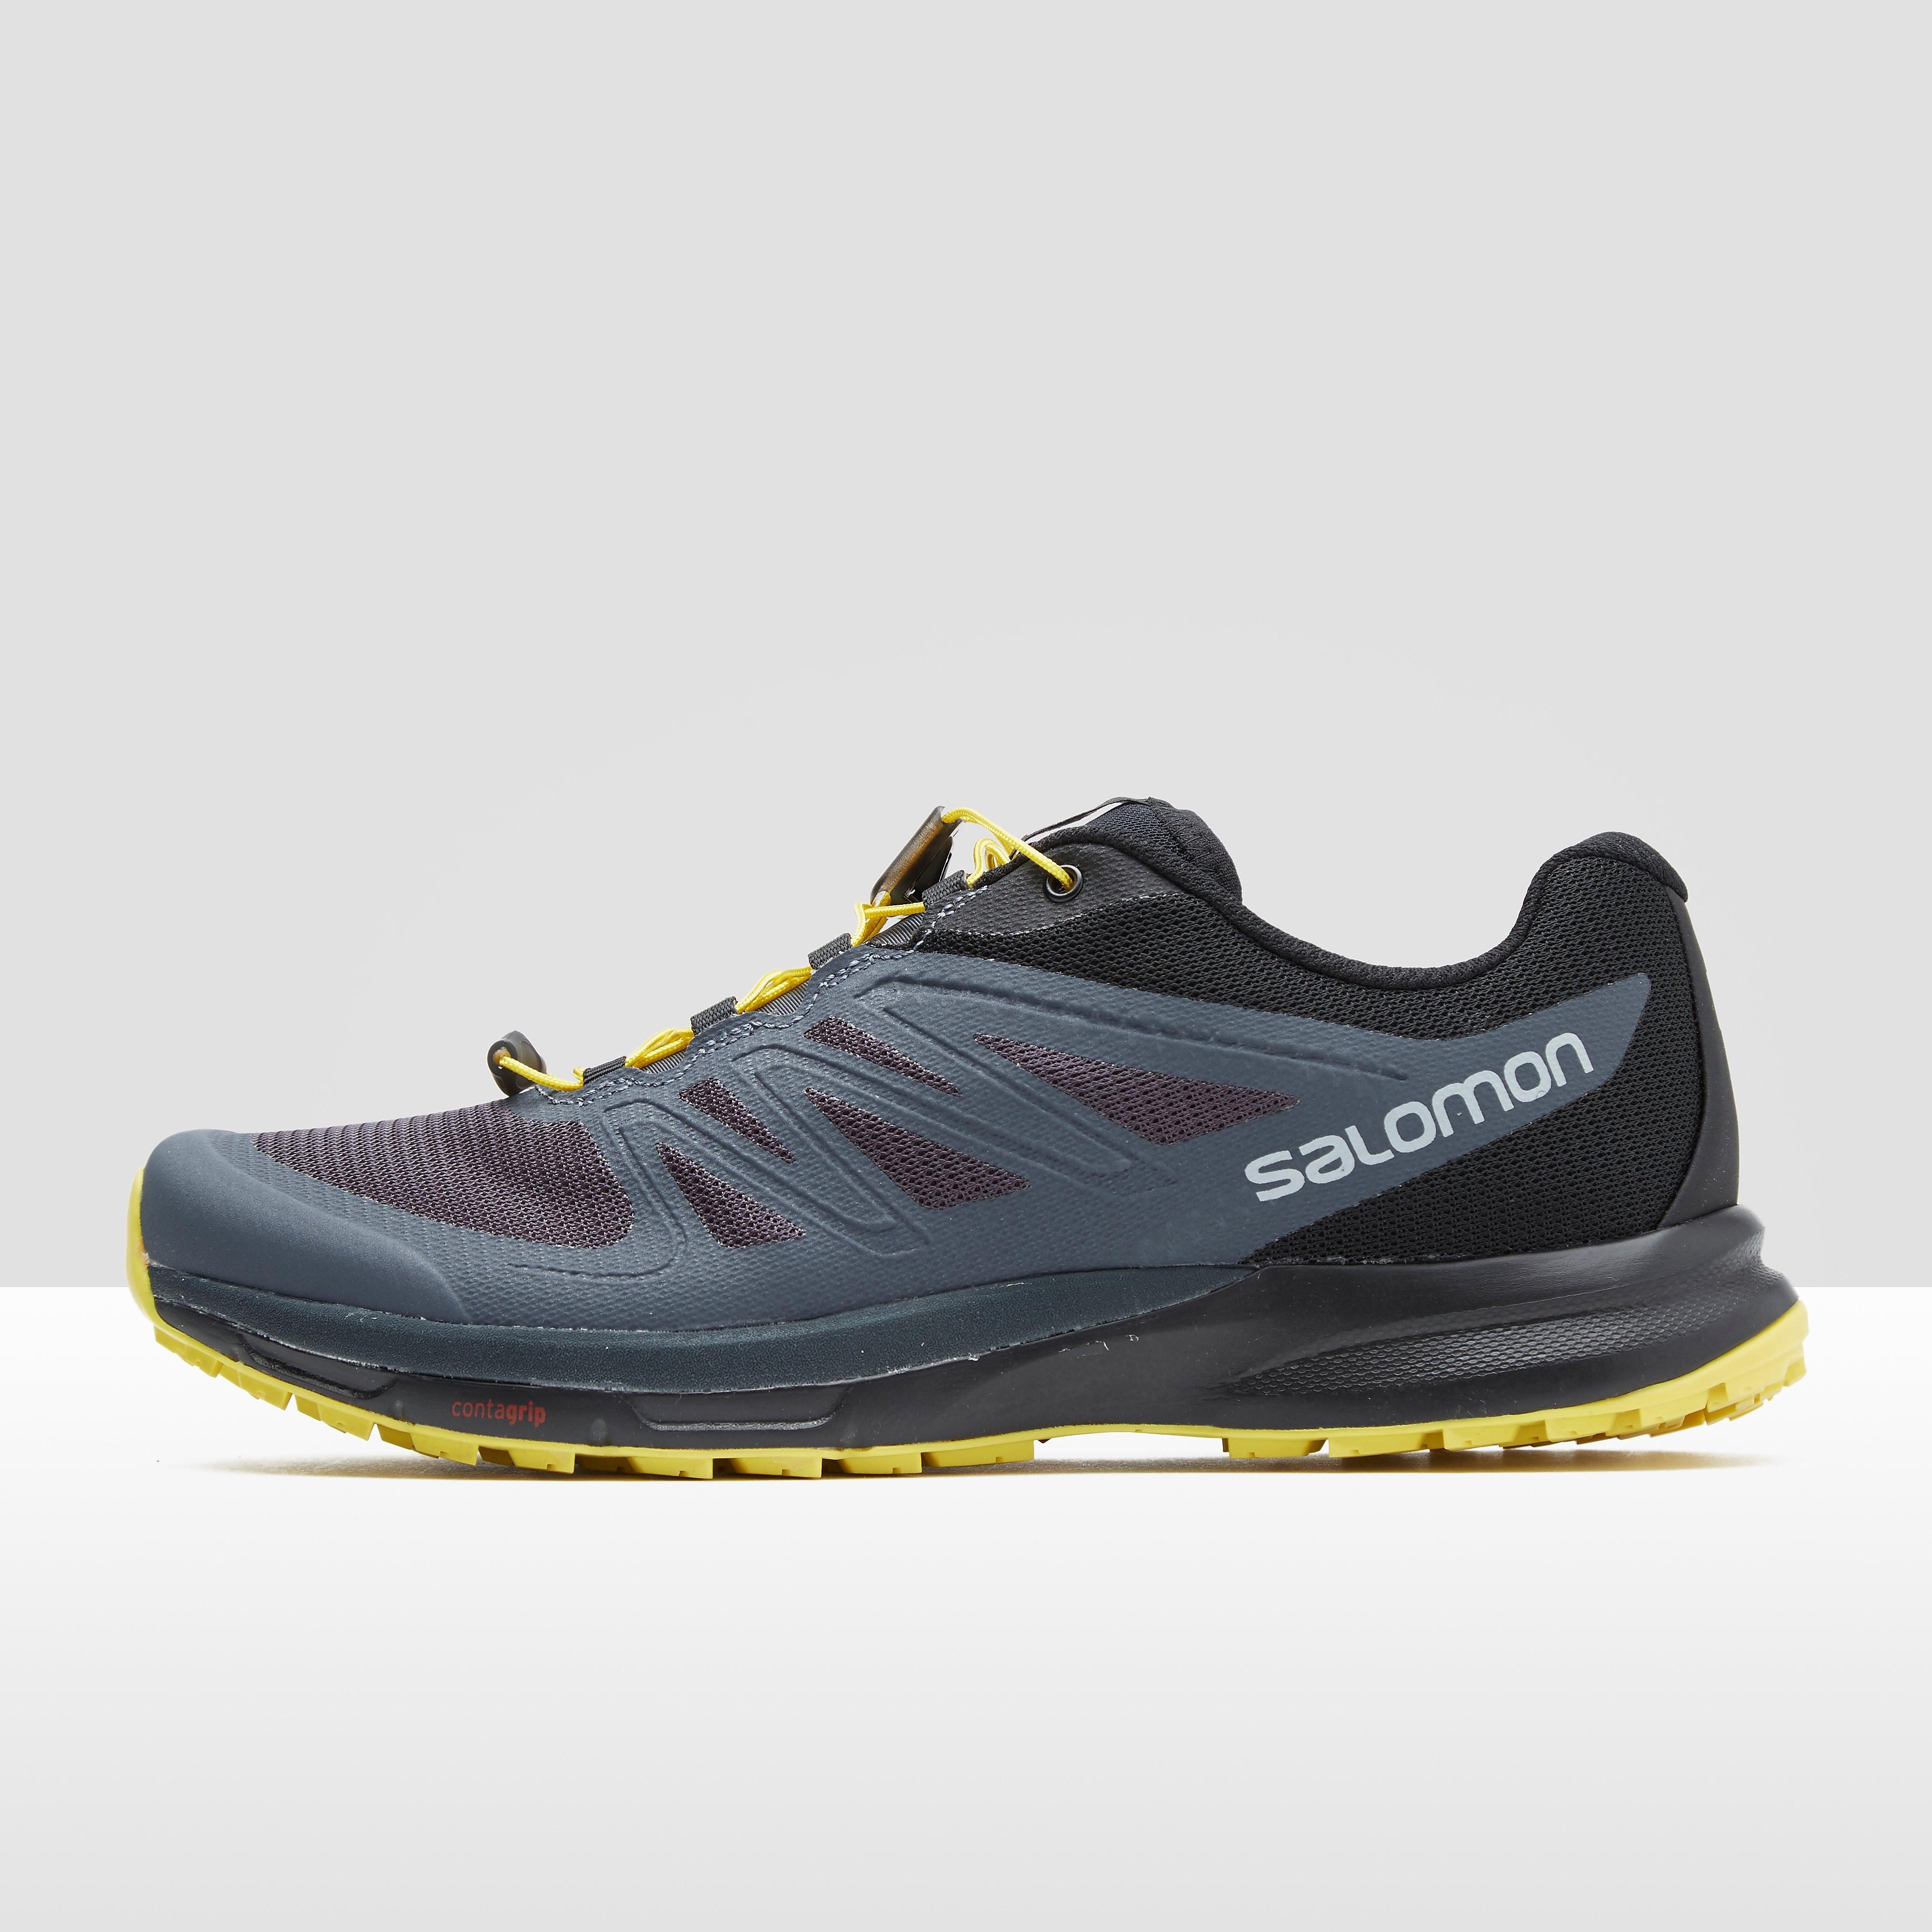 Salomon Sense Pro 2 Men's Trail Running Shoes